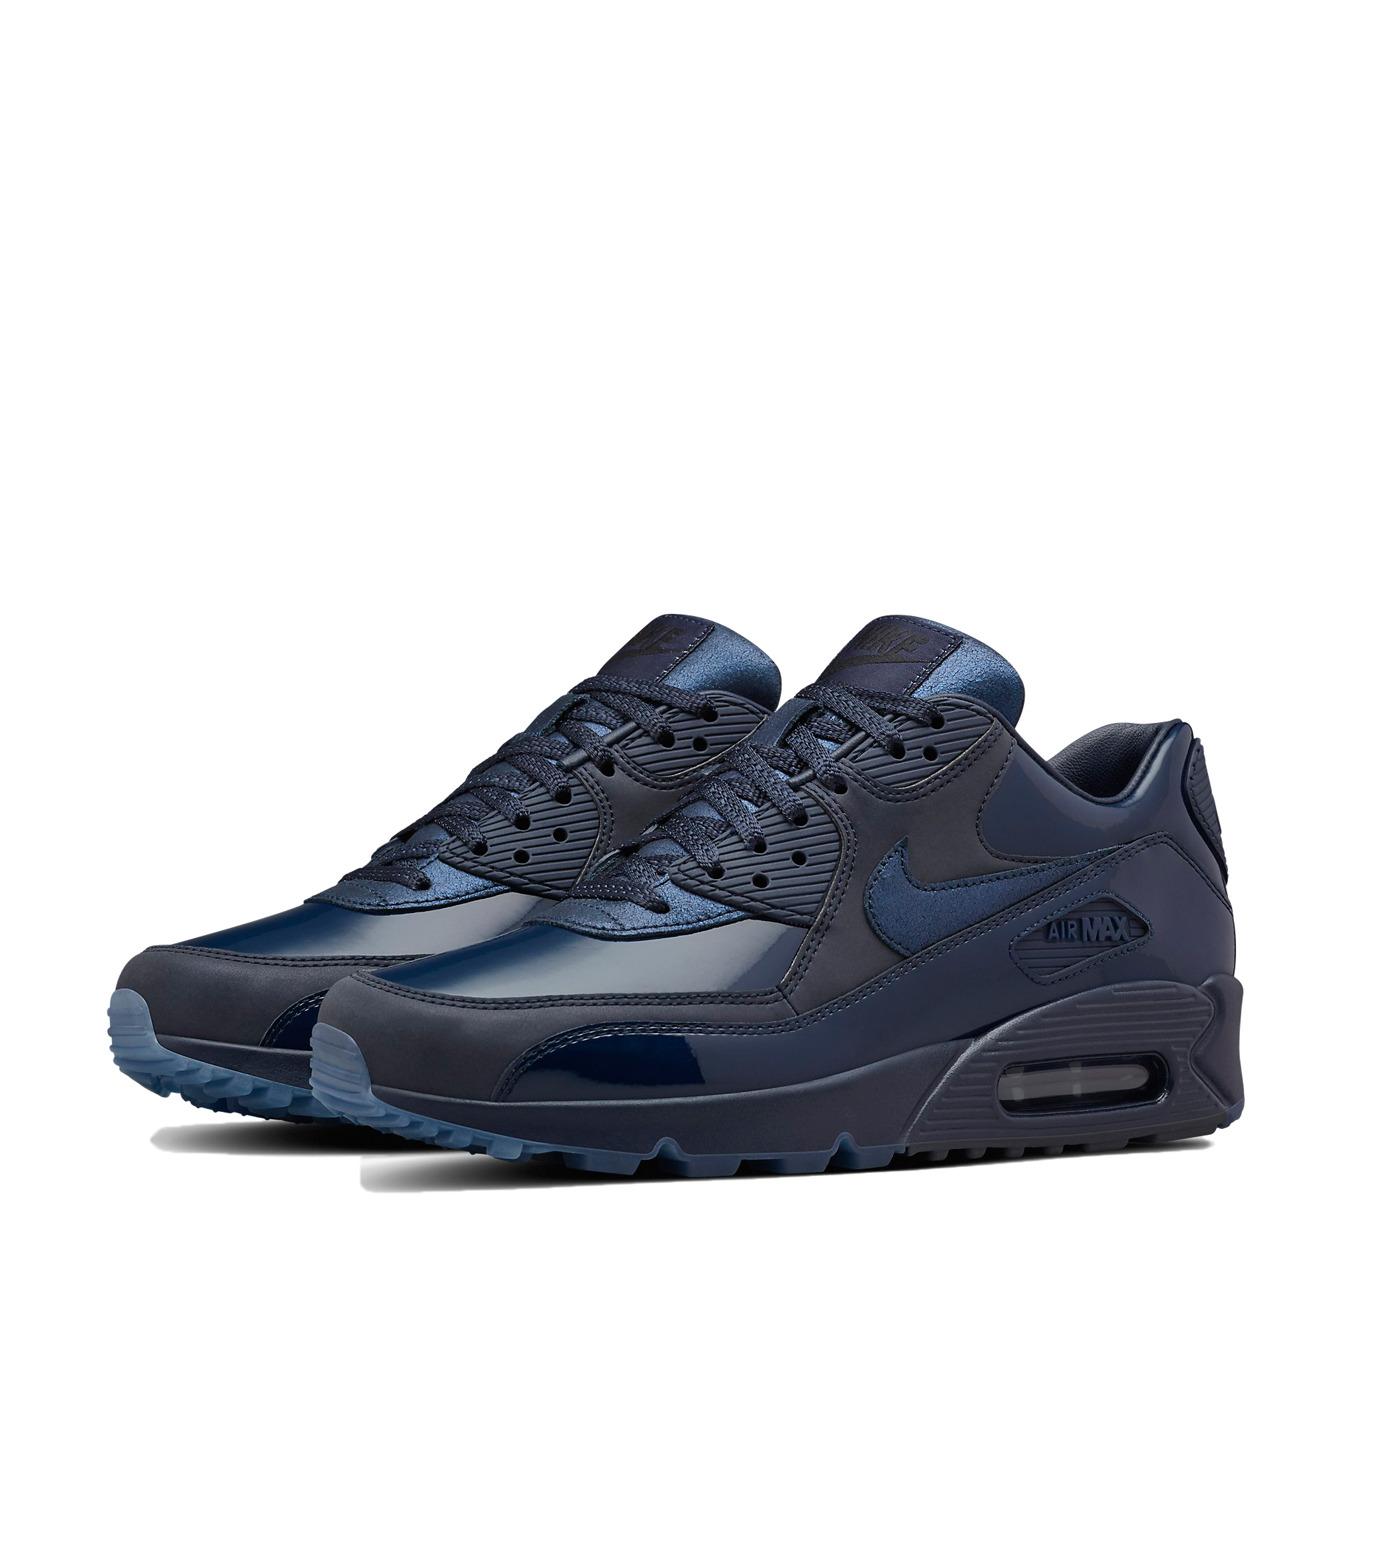 NIKE(ナイキ)のWMNS AIR MAX PEDRO LOURENCO-BLUE(シューズ/shoes)-867116-400-92 拡大詳細画像3